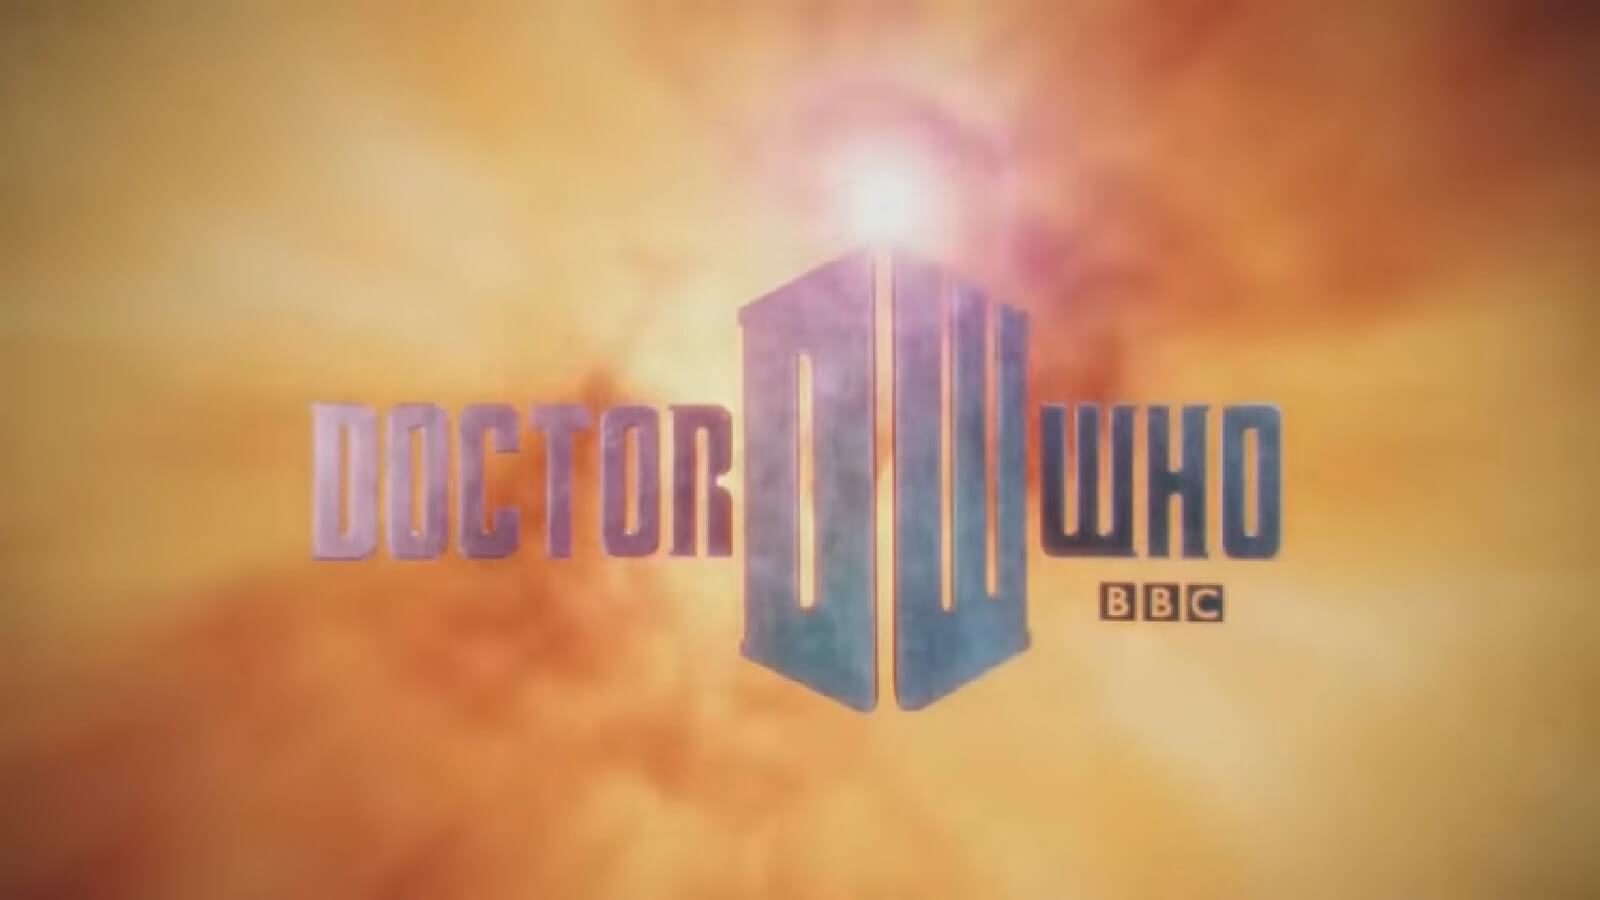 Series 6 Doctor Who Tardis Fandom